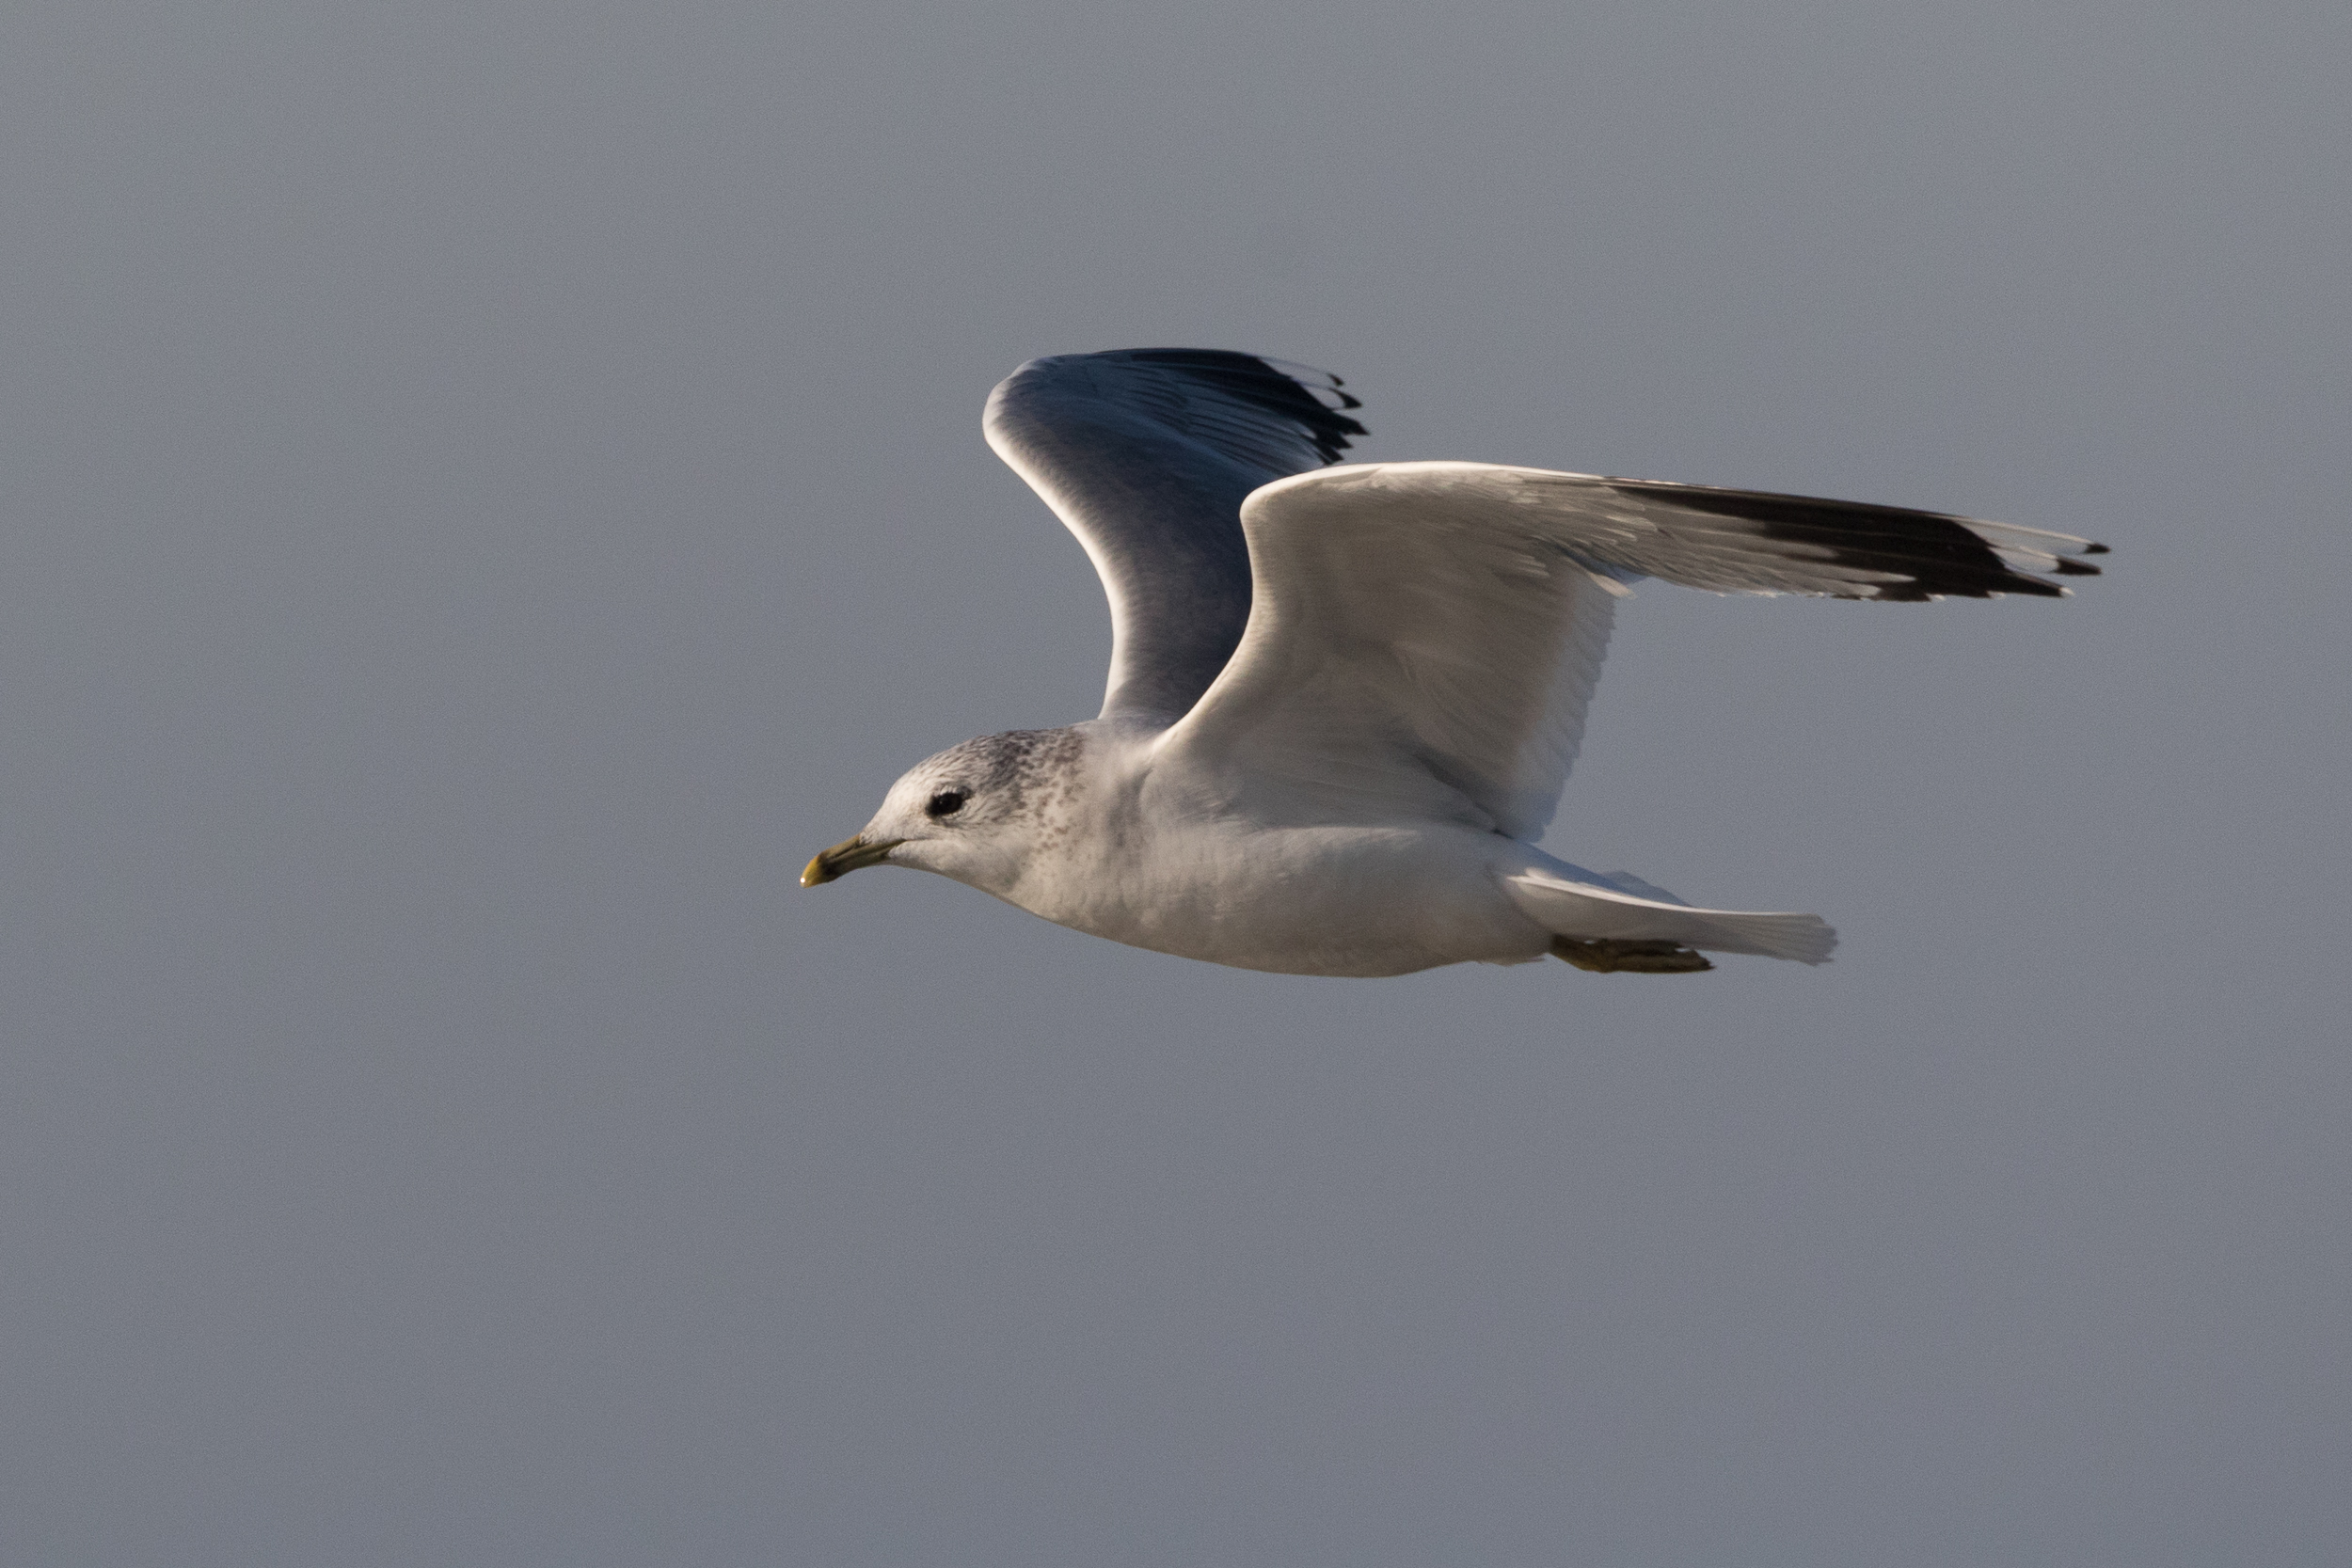 20170121-Common Gull Adult-121.jpg